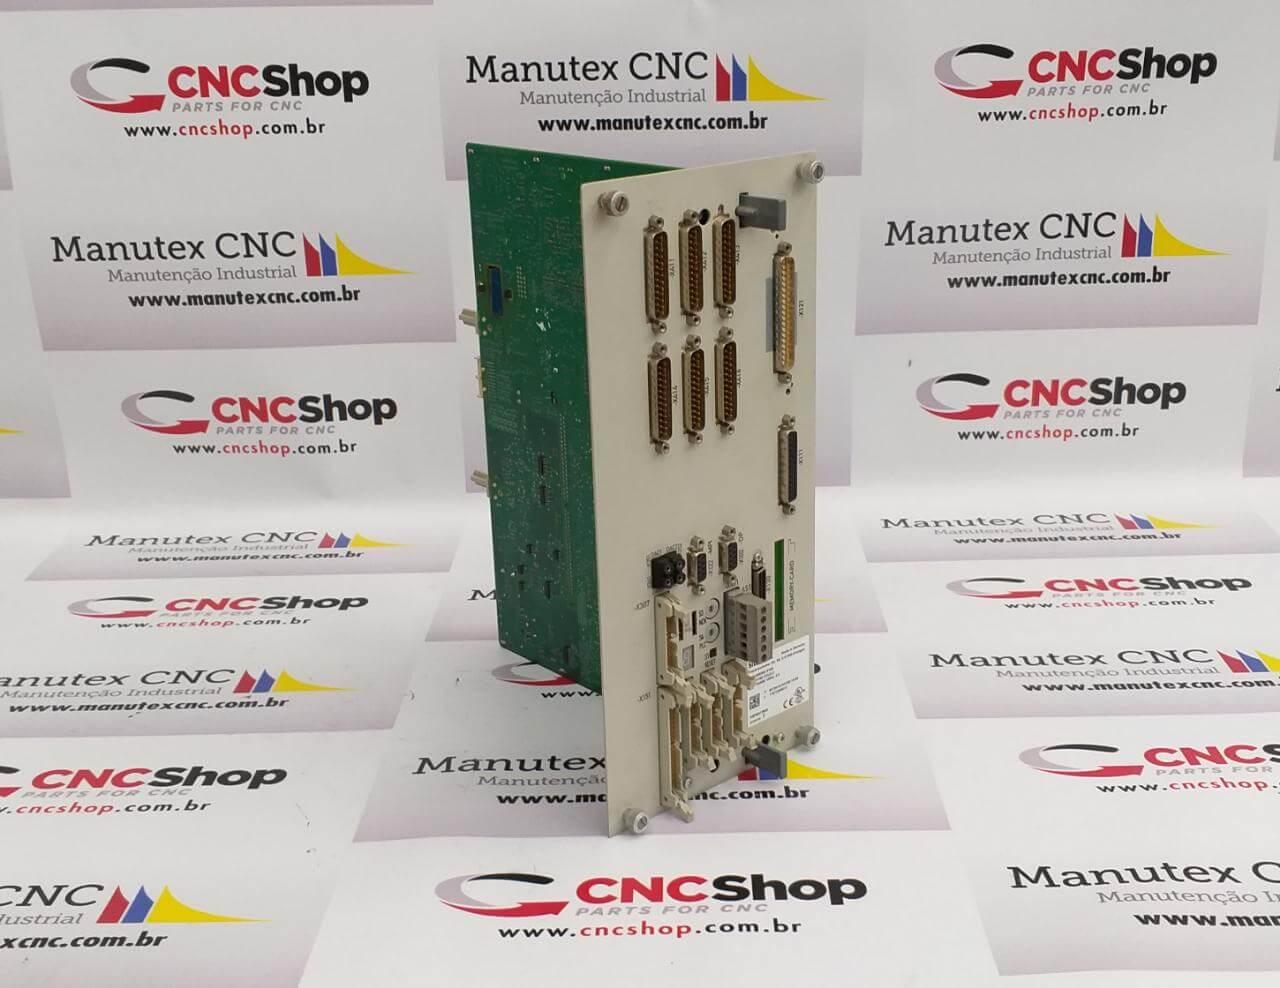 6FC5410-0AY03-1AA0 CCU V3.4 | CPU SINUMERIK | SIEMENS